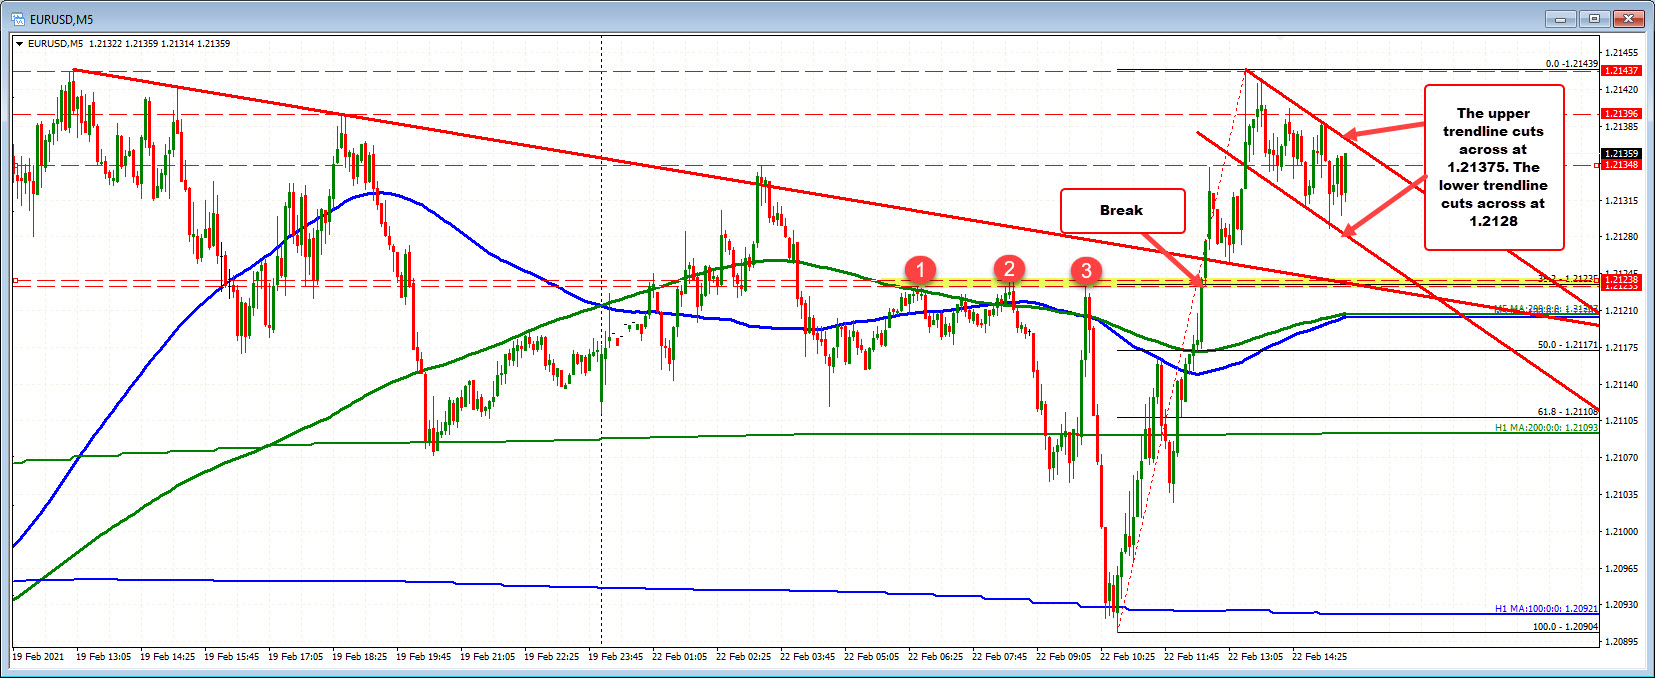 EURUSD on the 5 minutes chart